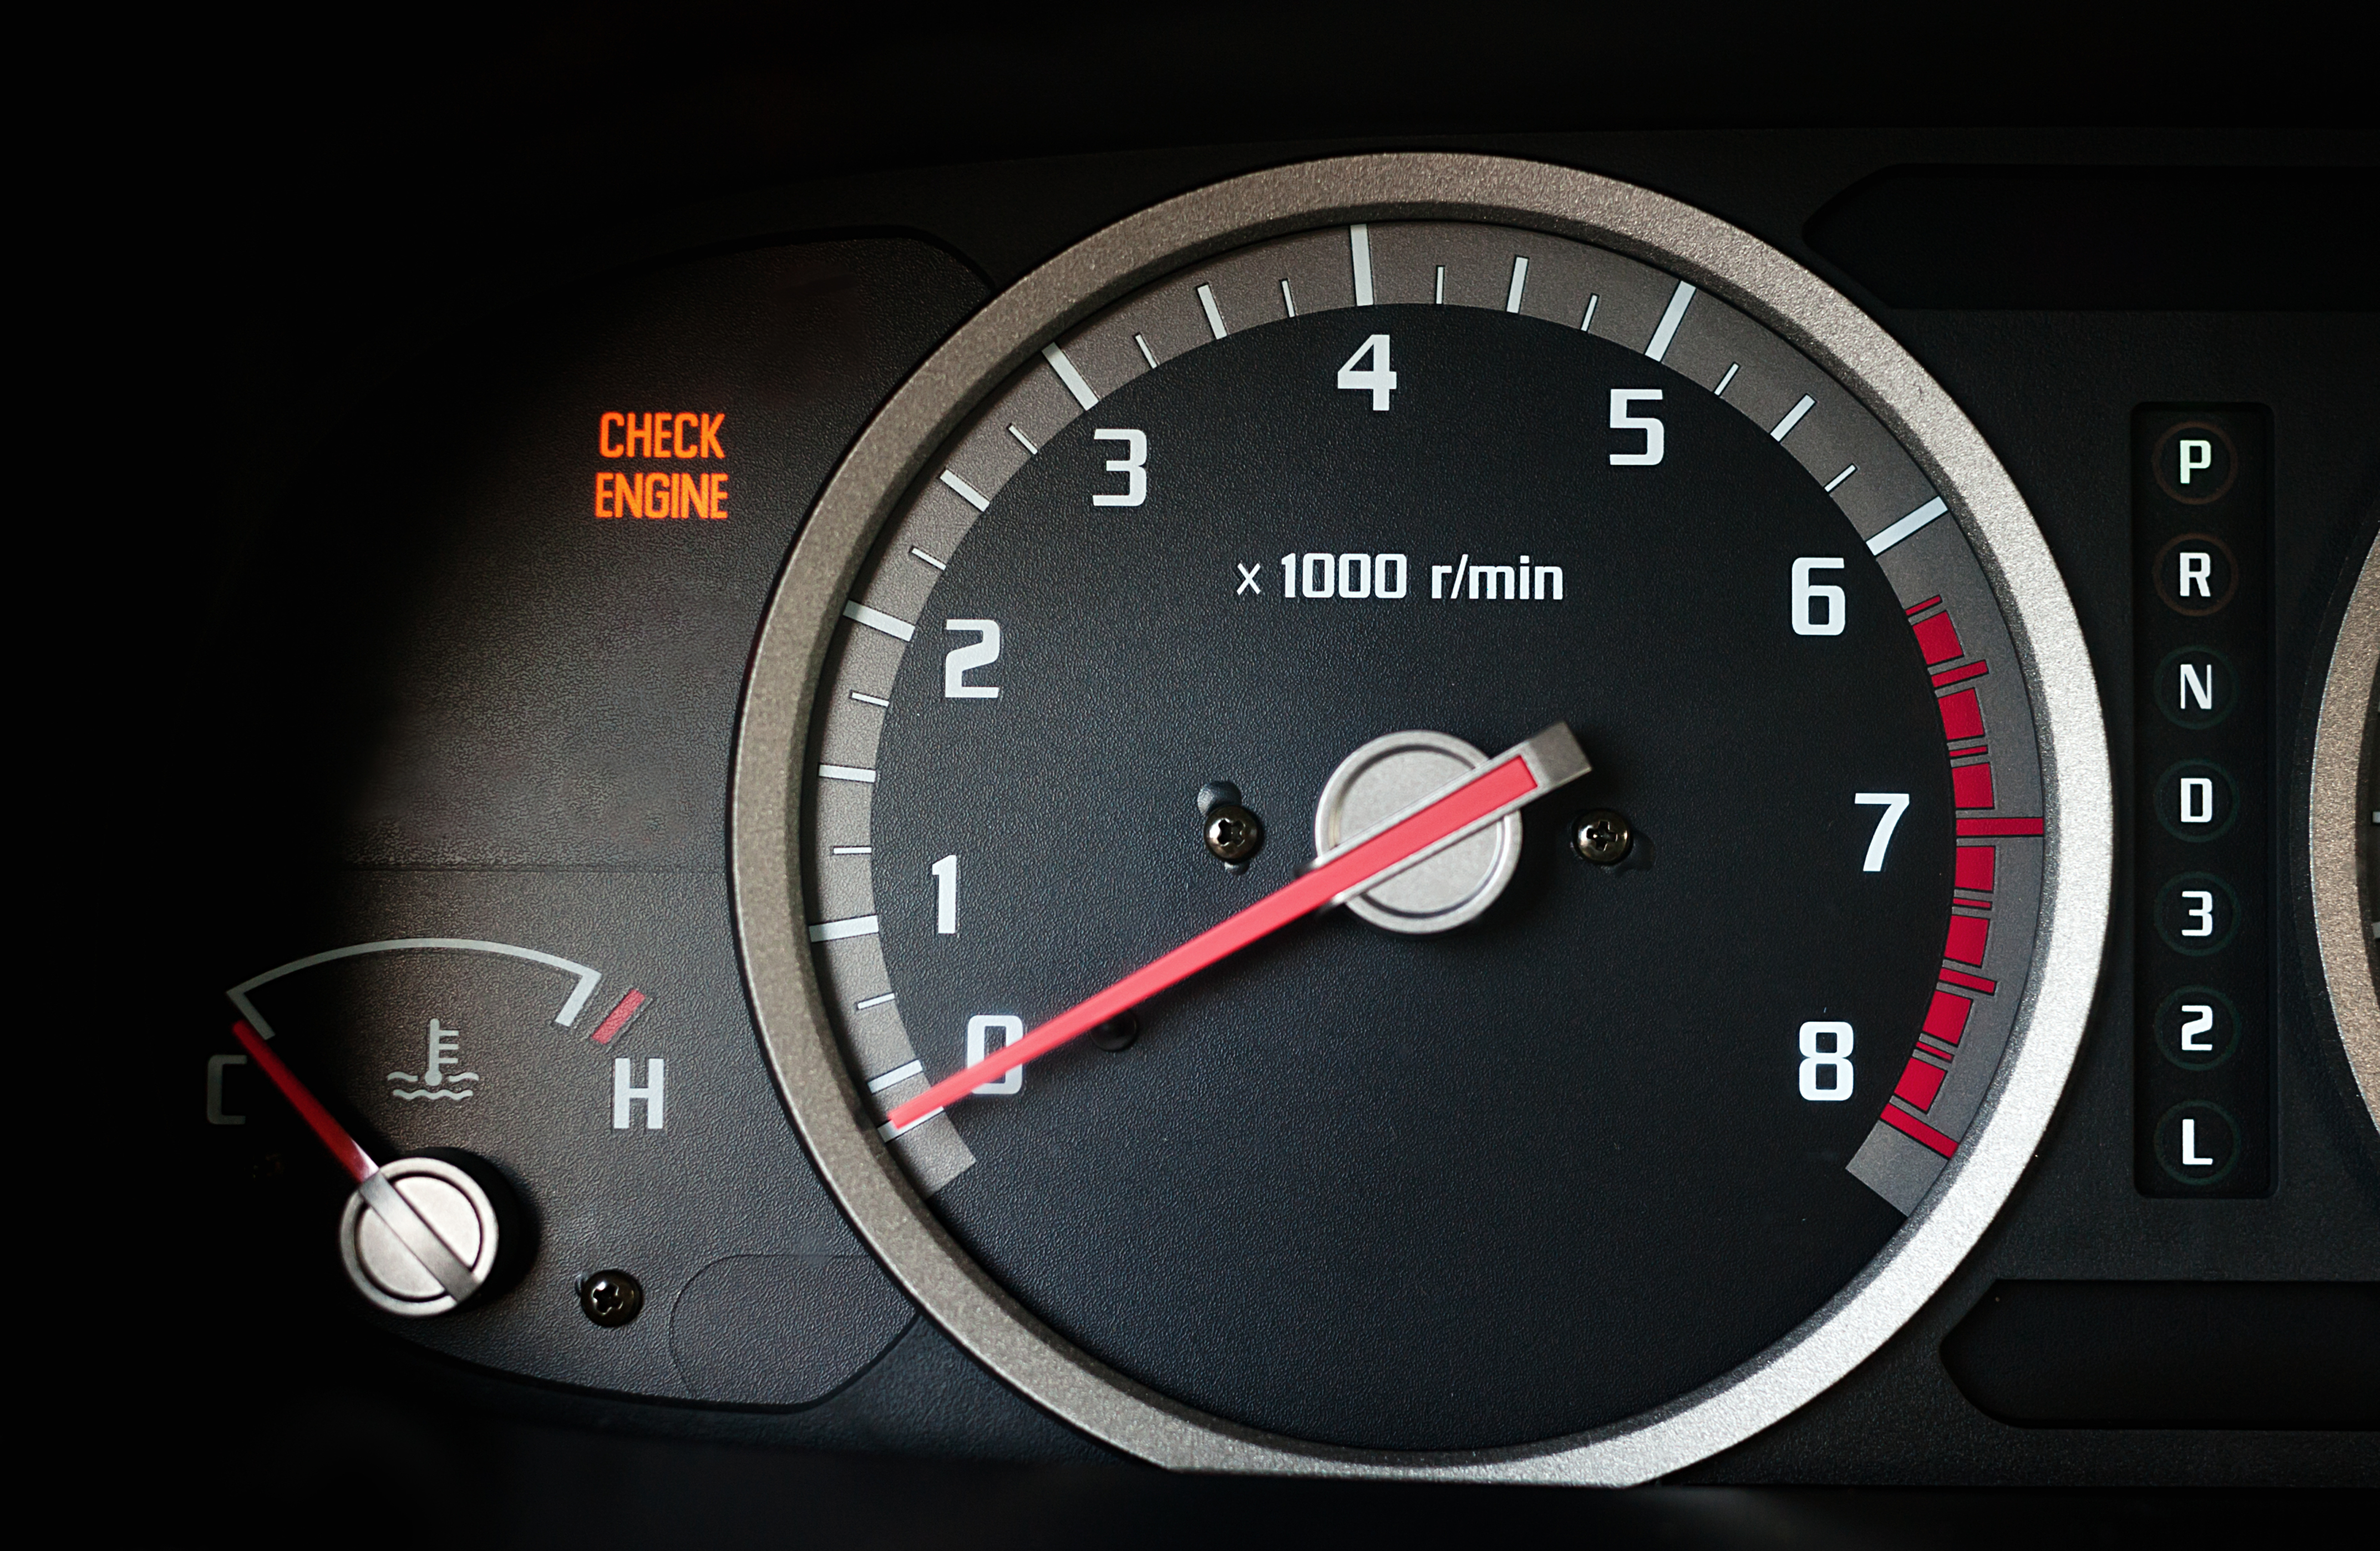 Image of Check Engine Light Alongside Spedometer